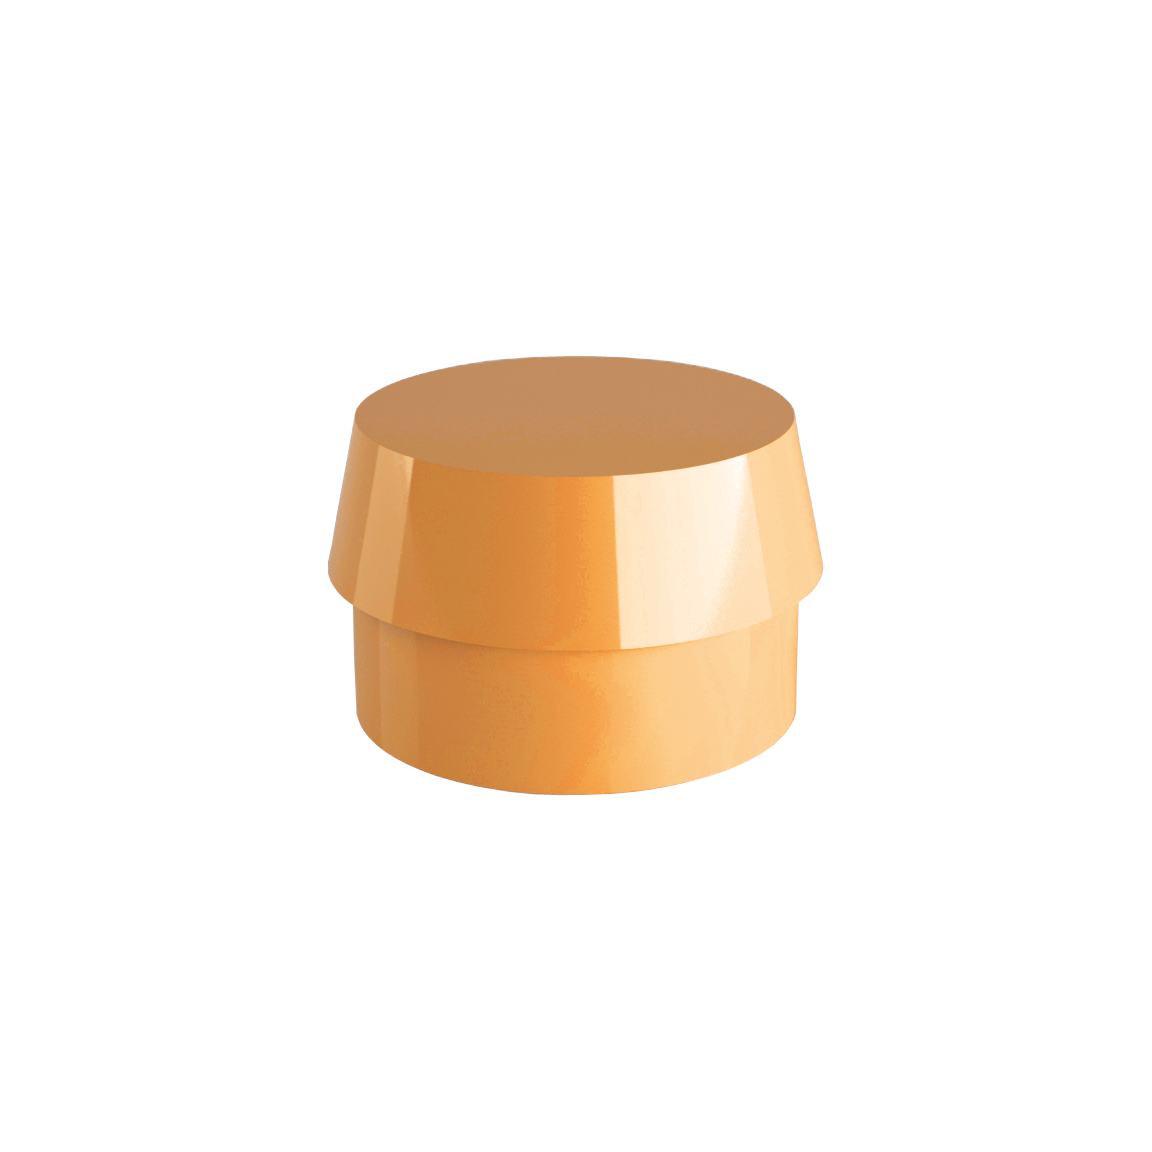 Nylonkappe R-NC 2 erhöhte Friktion